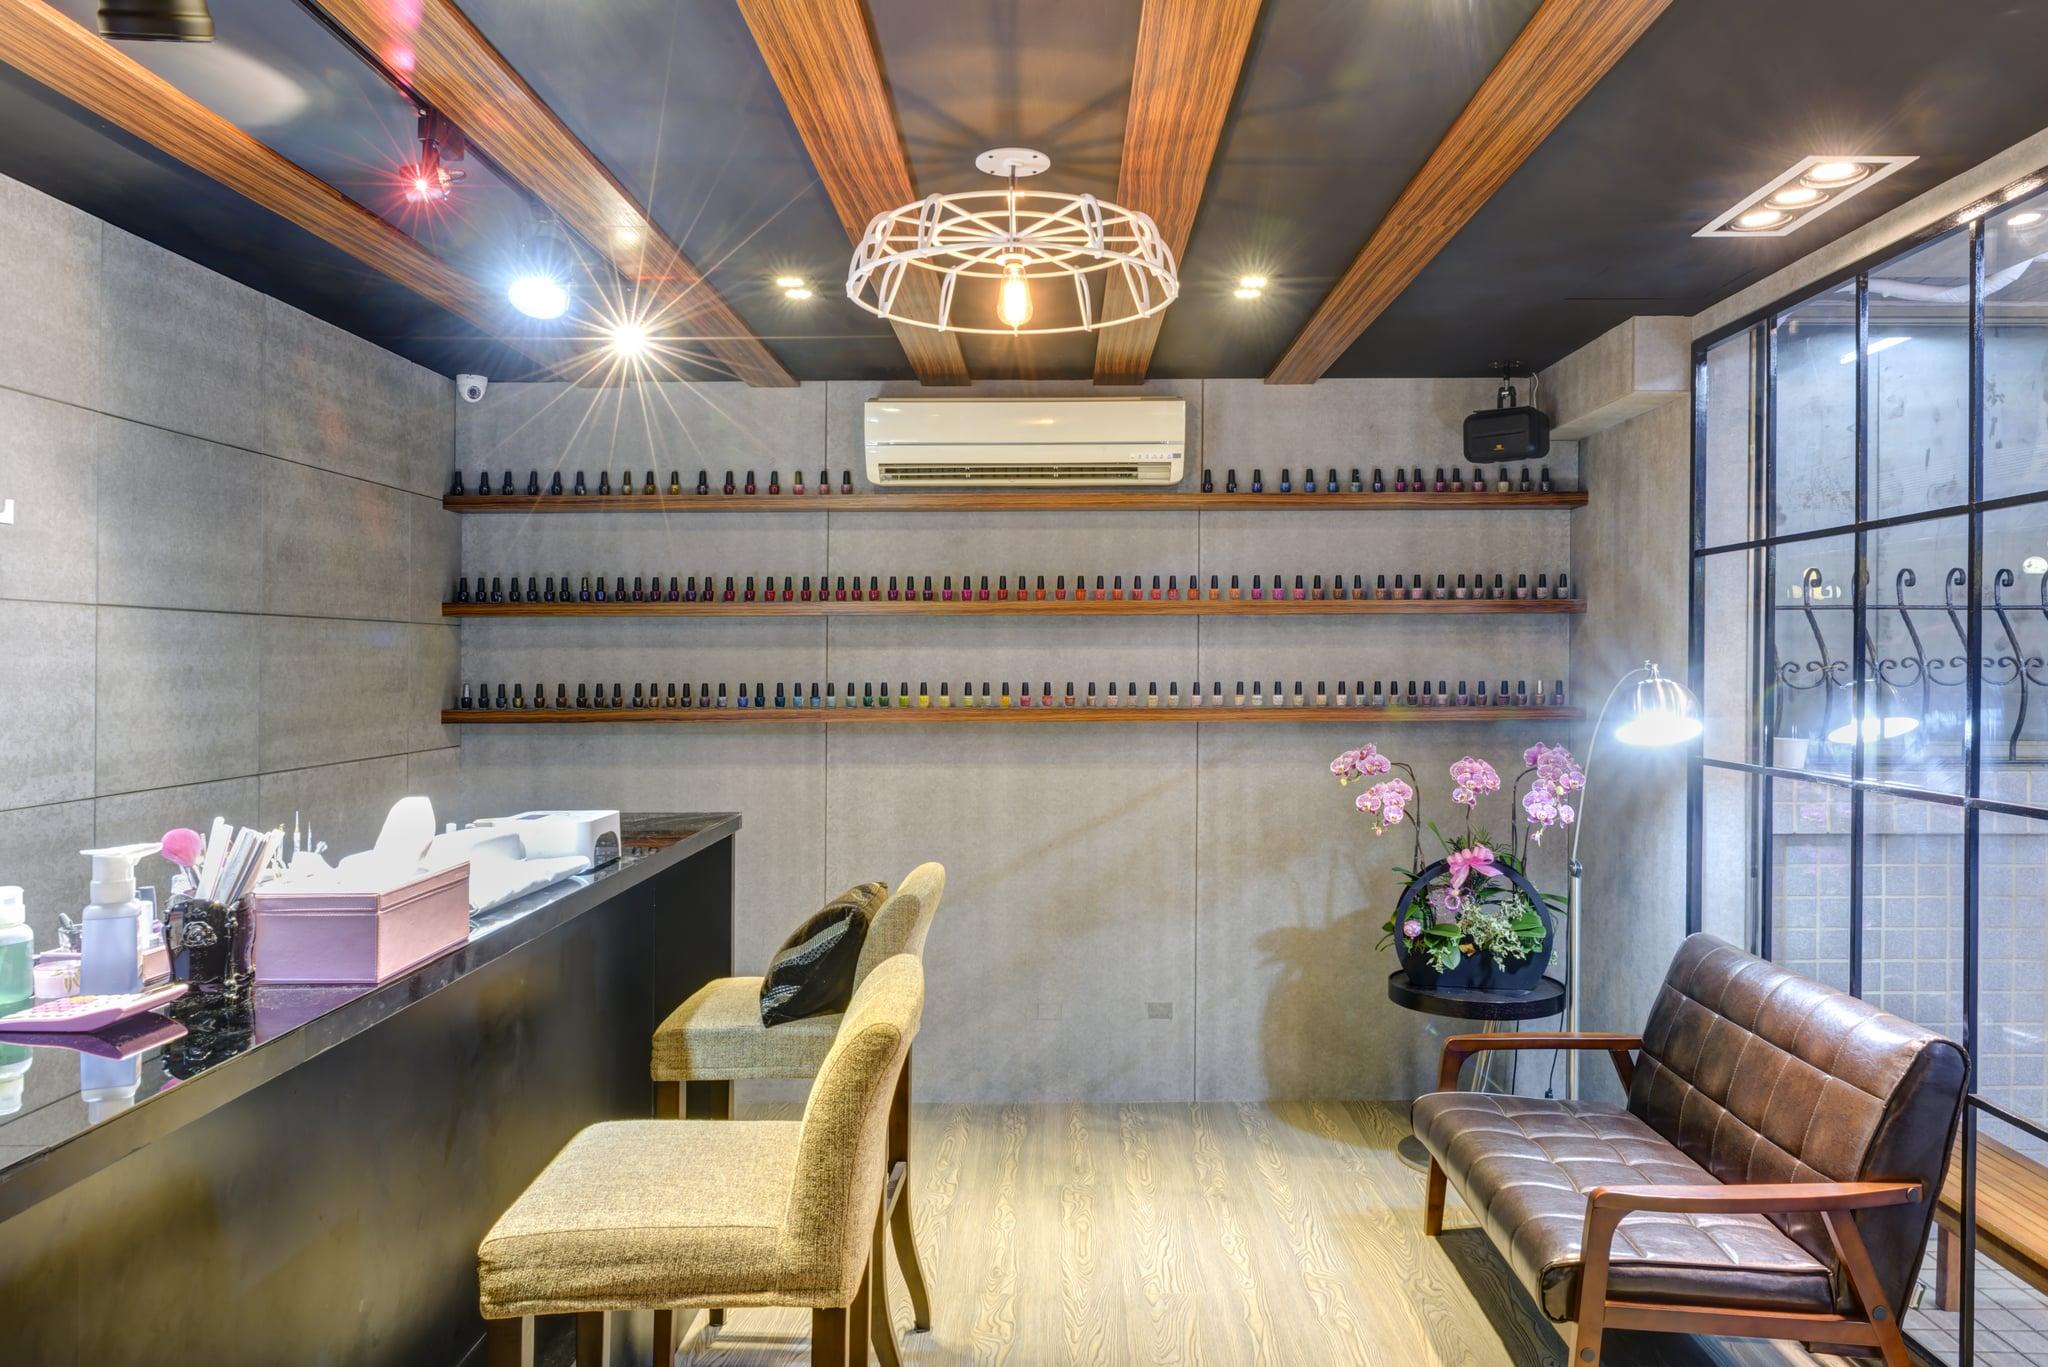 When Will States Reopen Nail Salons Amid Coronavirus Popsugar Beauty